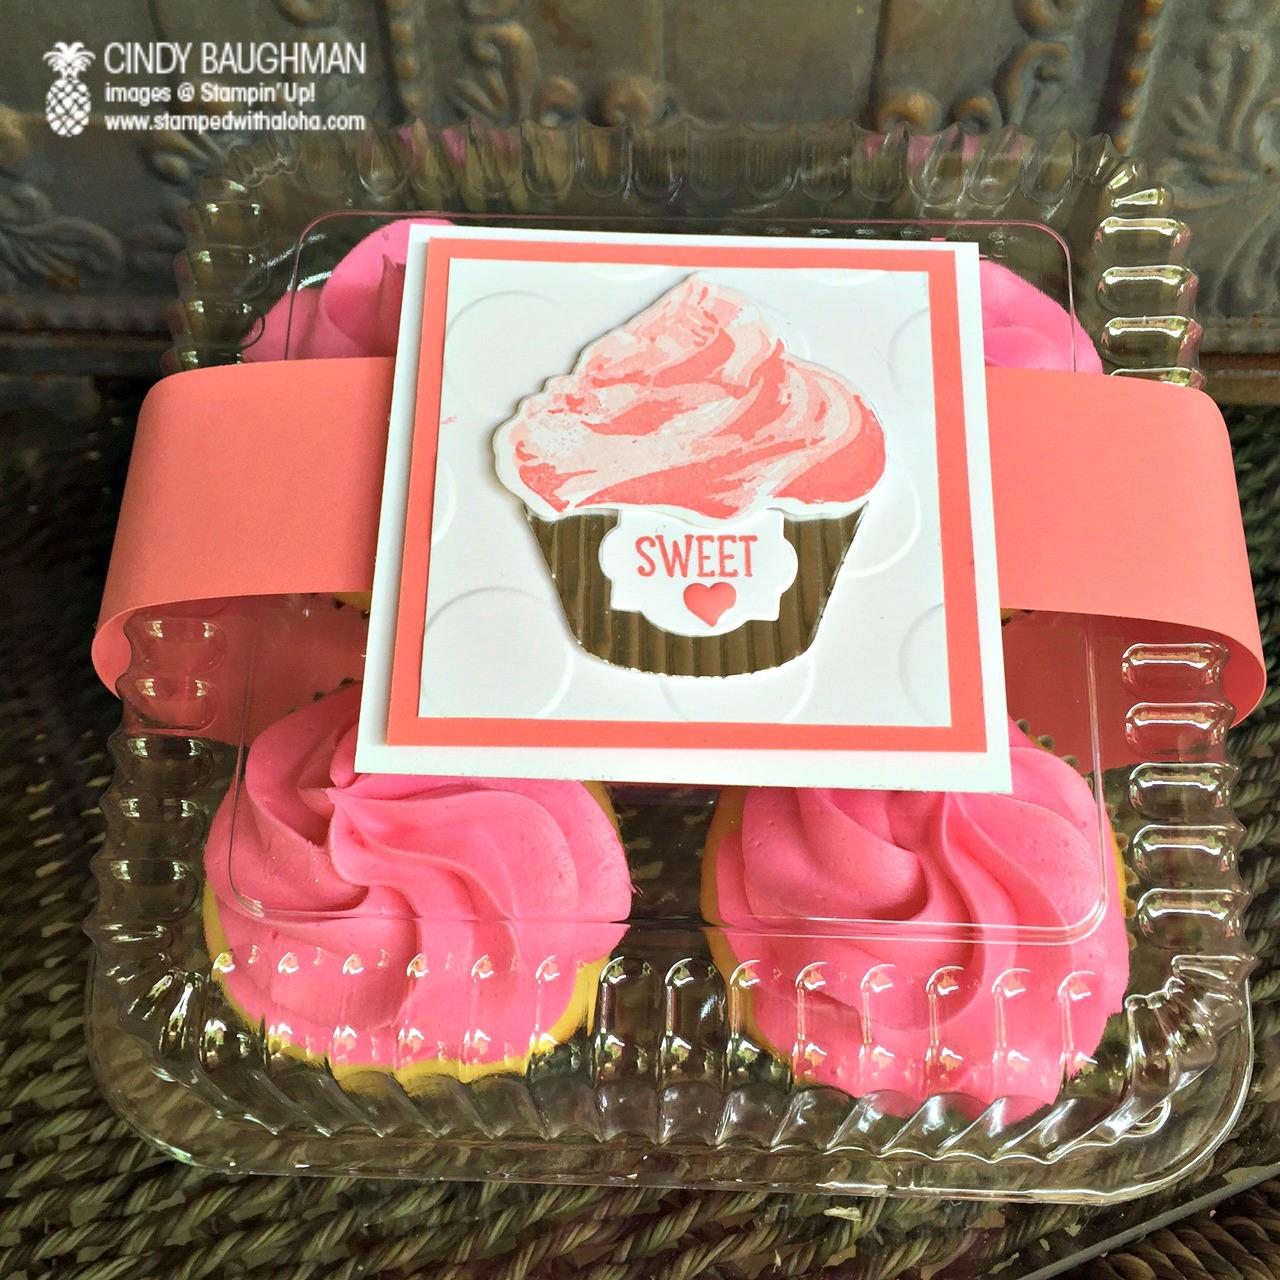 Charney's Cupcakes and Treats, Aloha Prize - www.stampedwithaloha.com